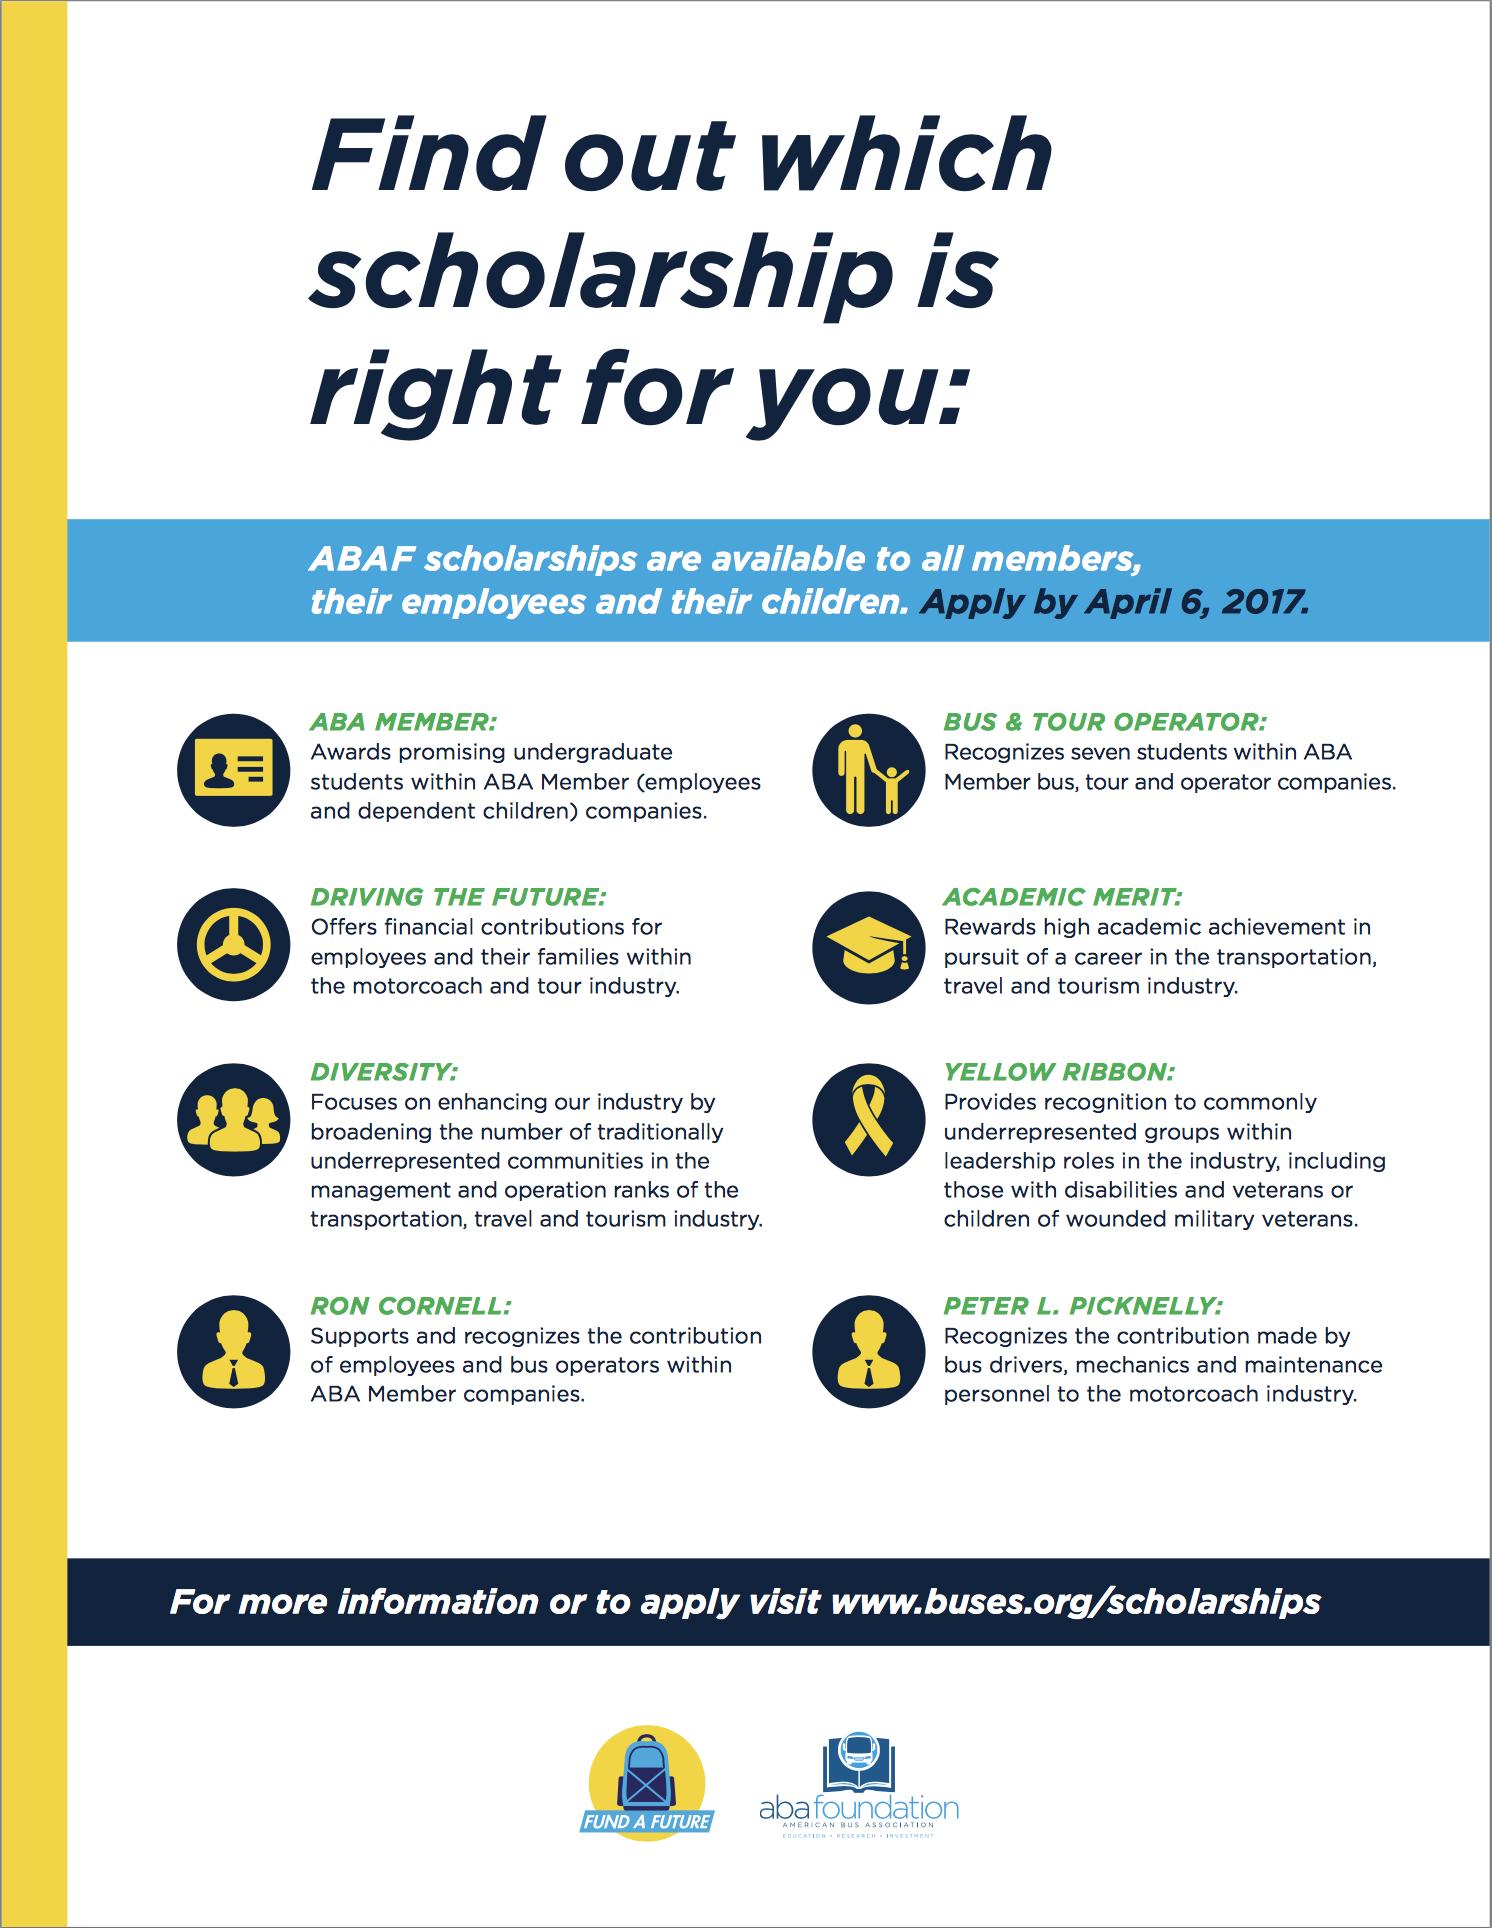 ABA Scholarship Fund